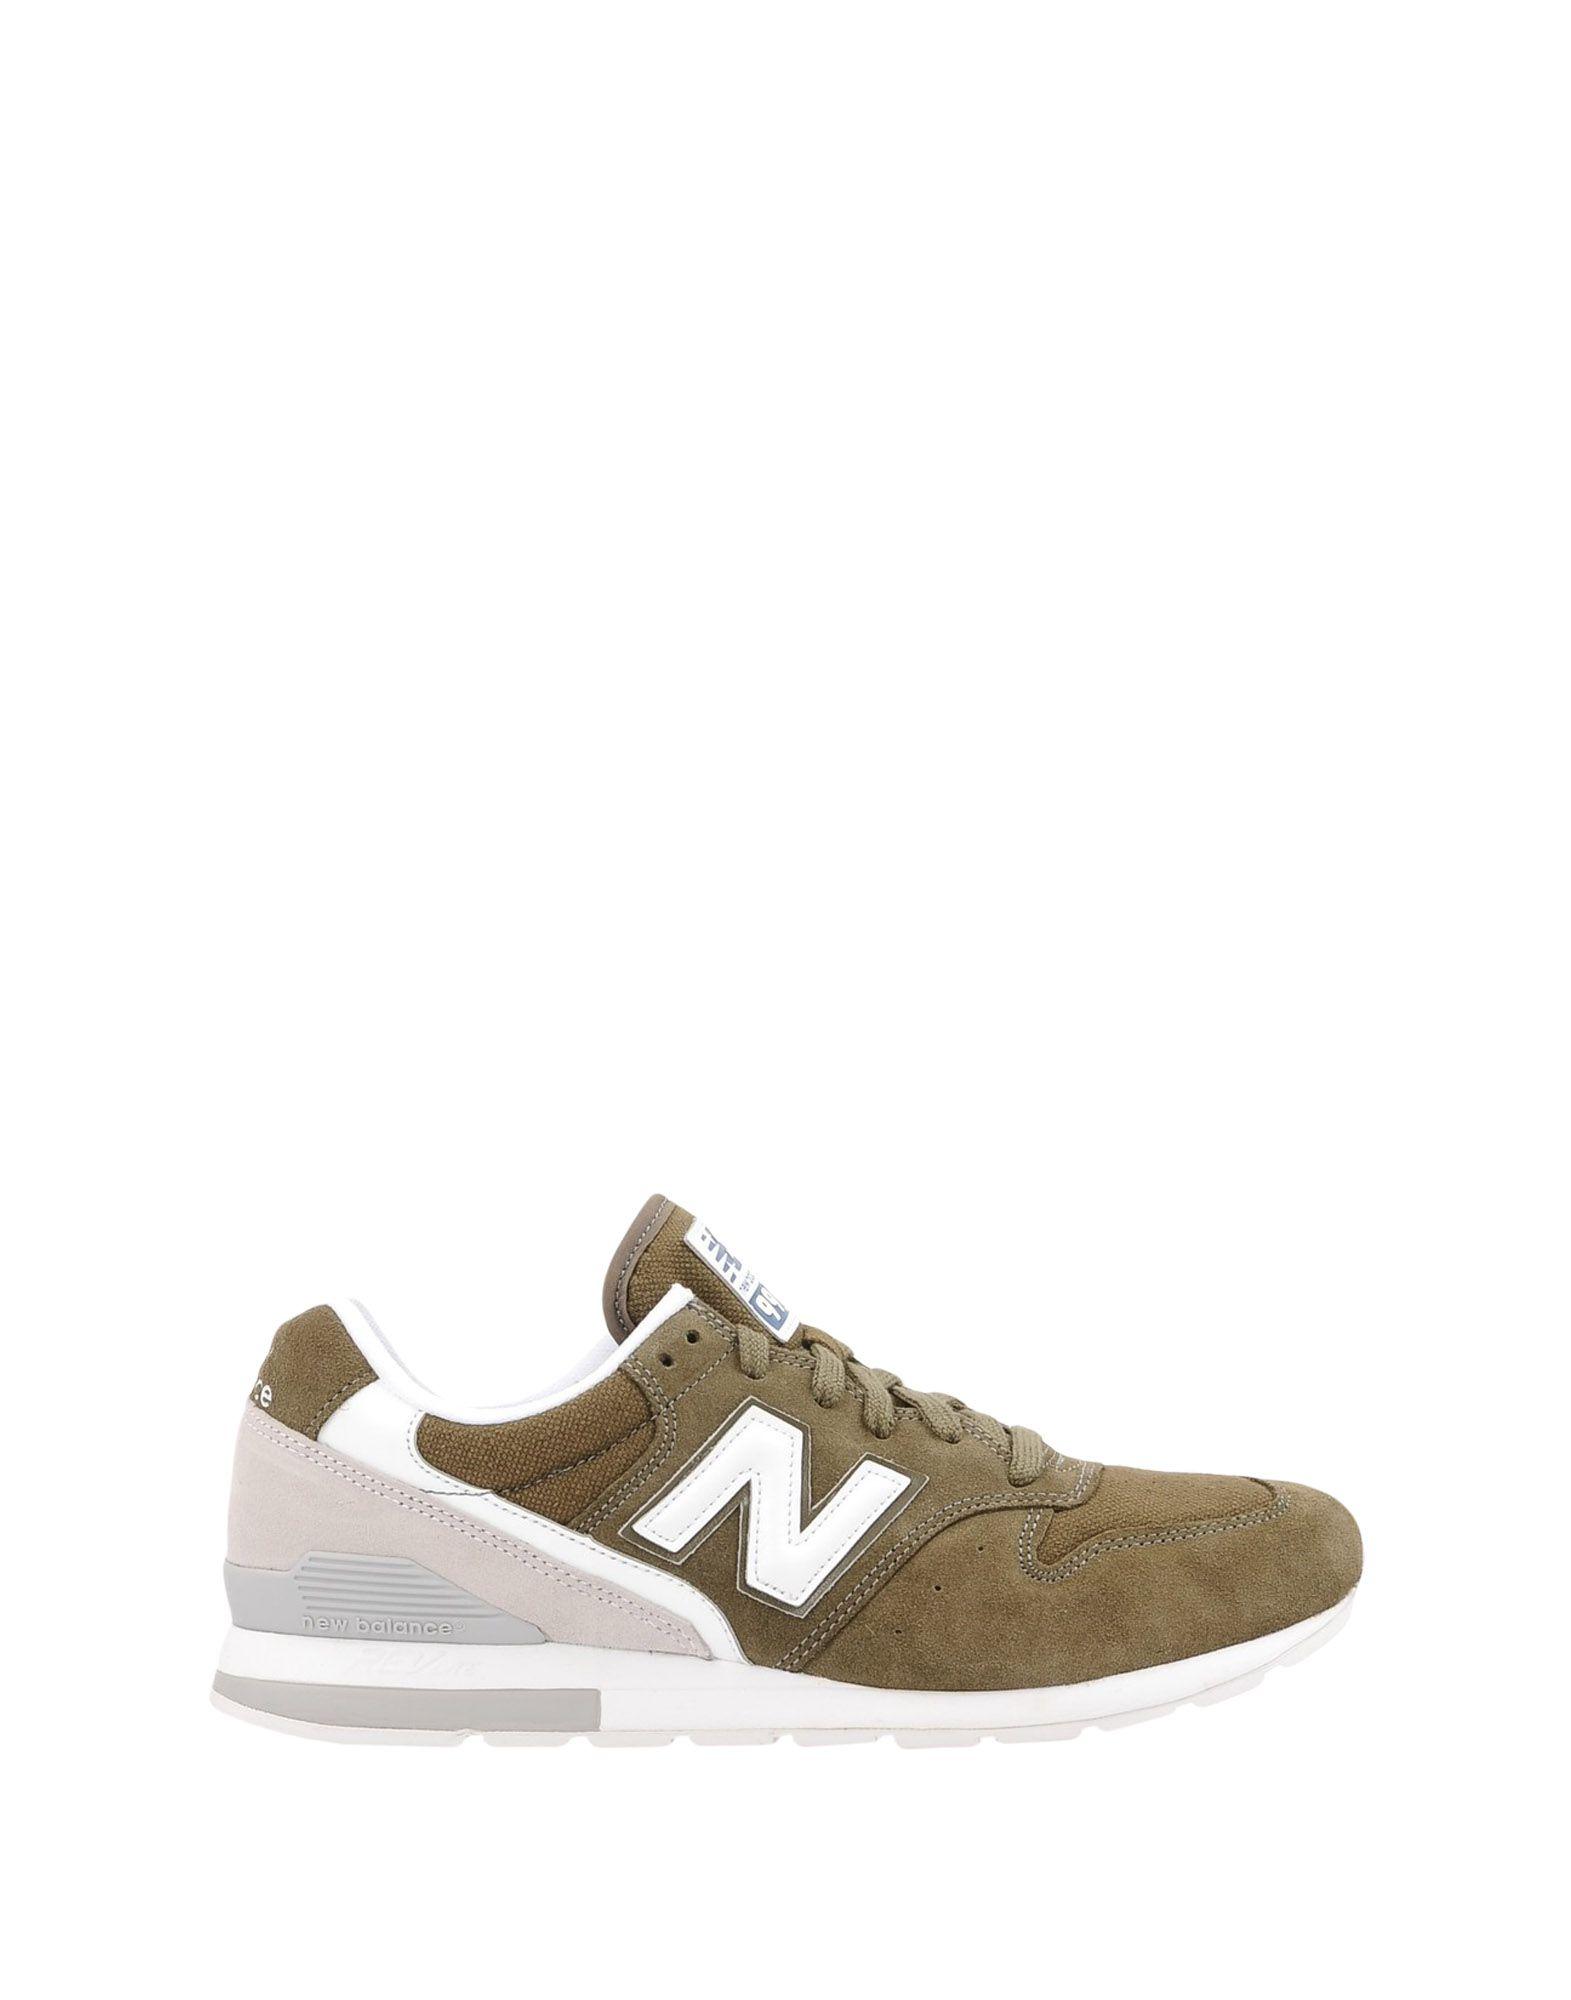 Rabatt Balance echte Schuhe New Balance Rabatt 996 Textile  11333575PV edc8b6